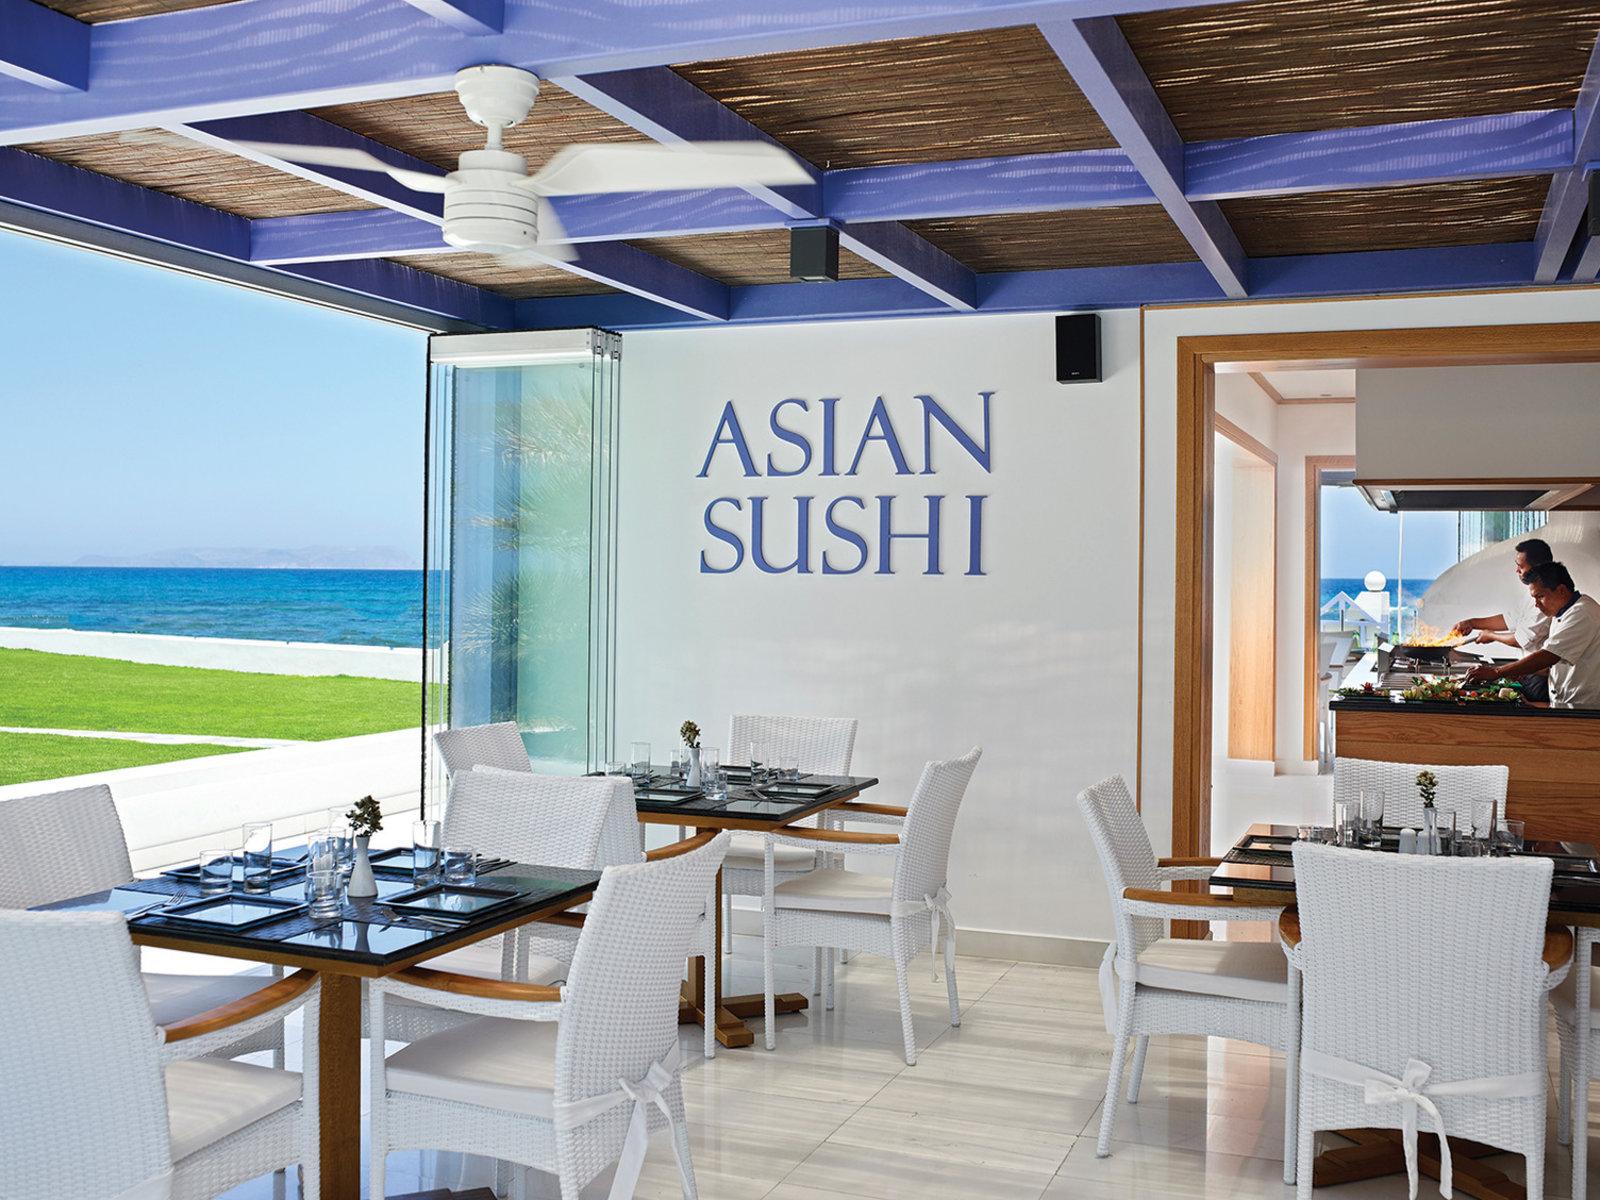 Asian - Sushi Restaurant